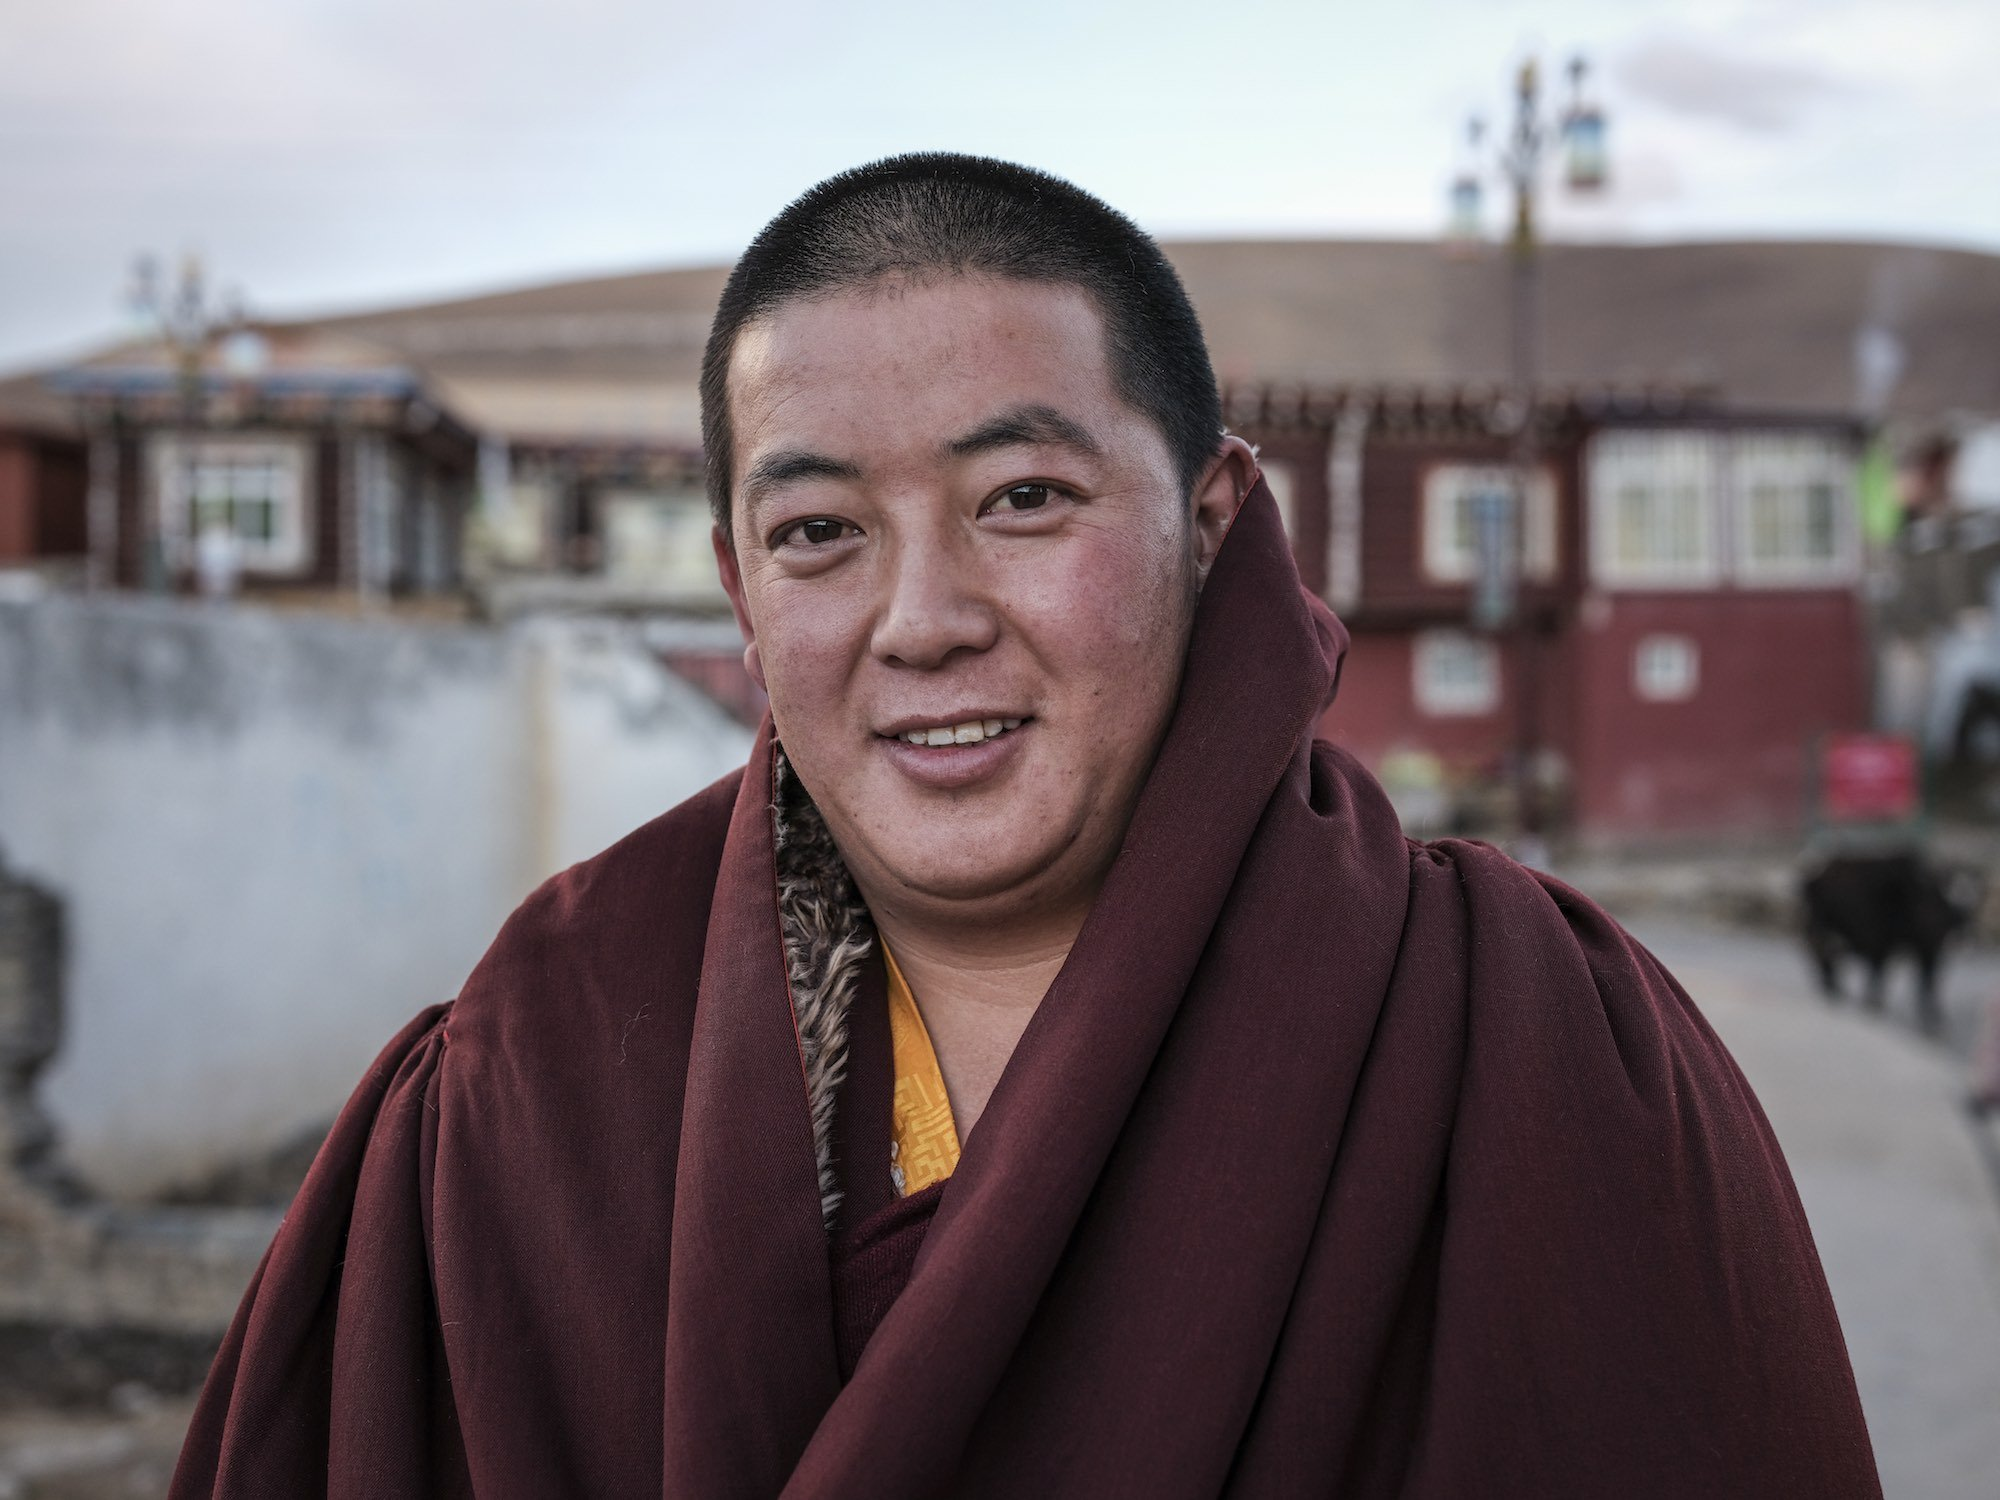 Tibet China Jose Jeuland Fujifilm GFX 50R x photographer travel documentary photography